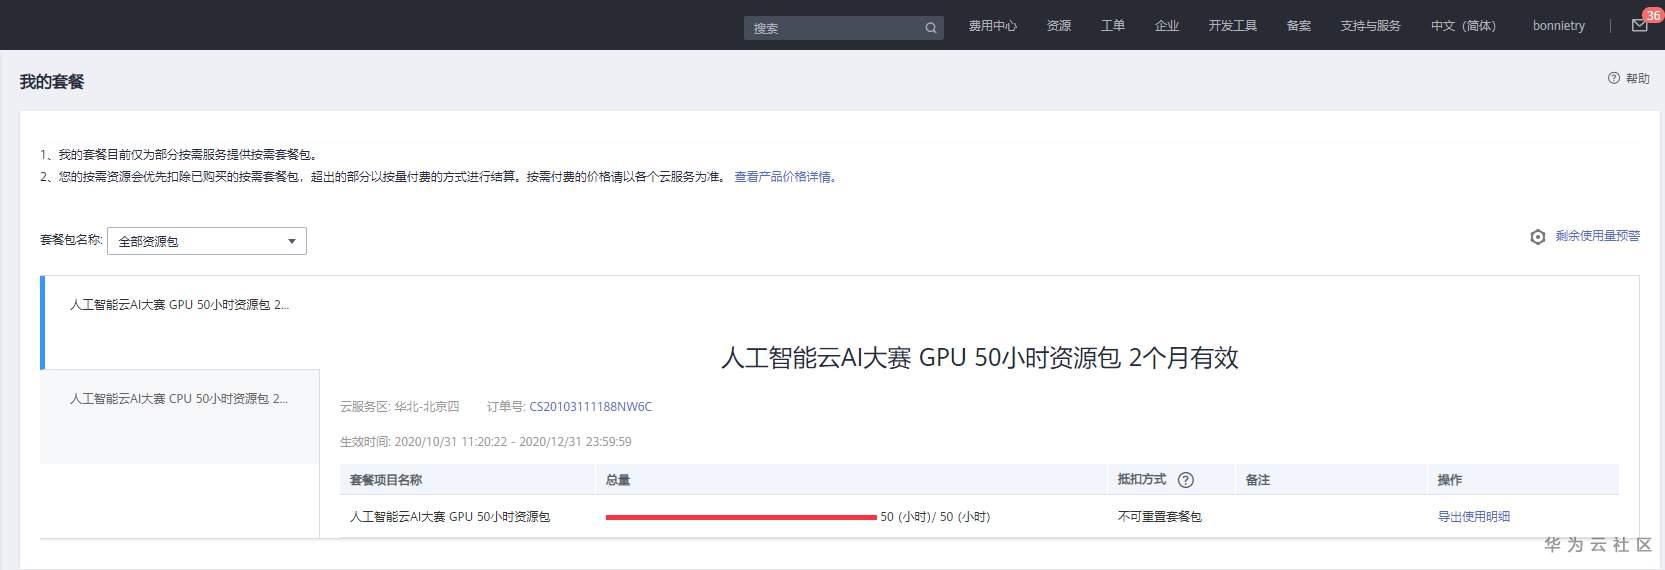 QQ图片20201110190919.png